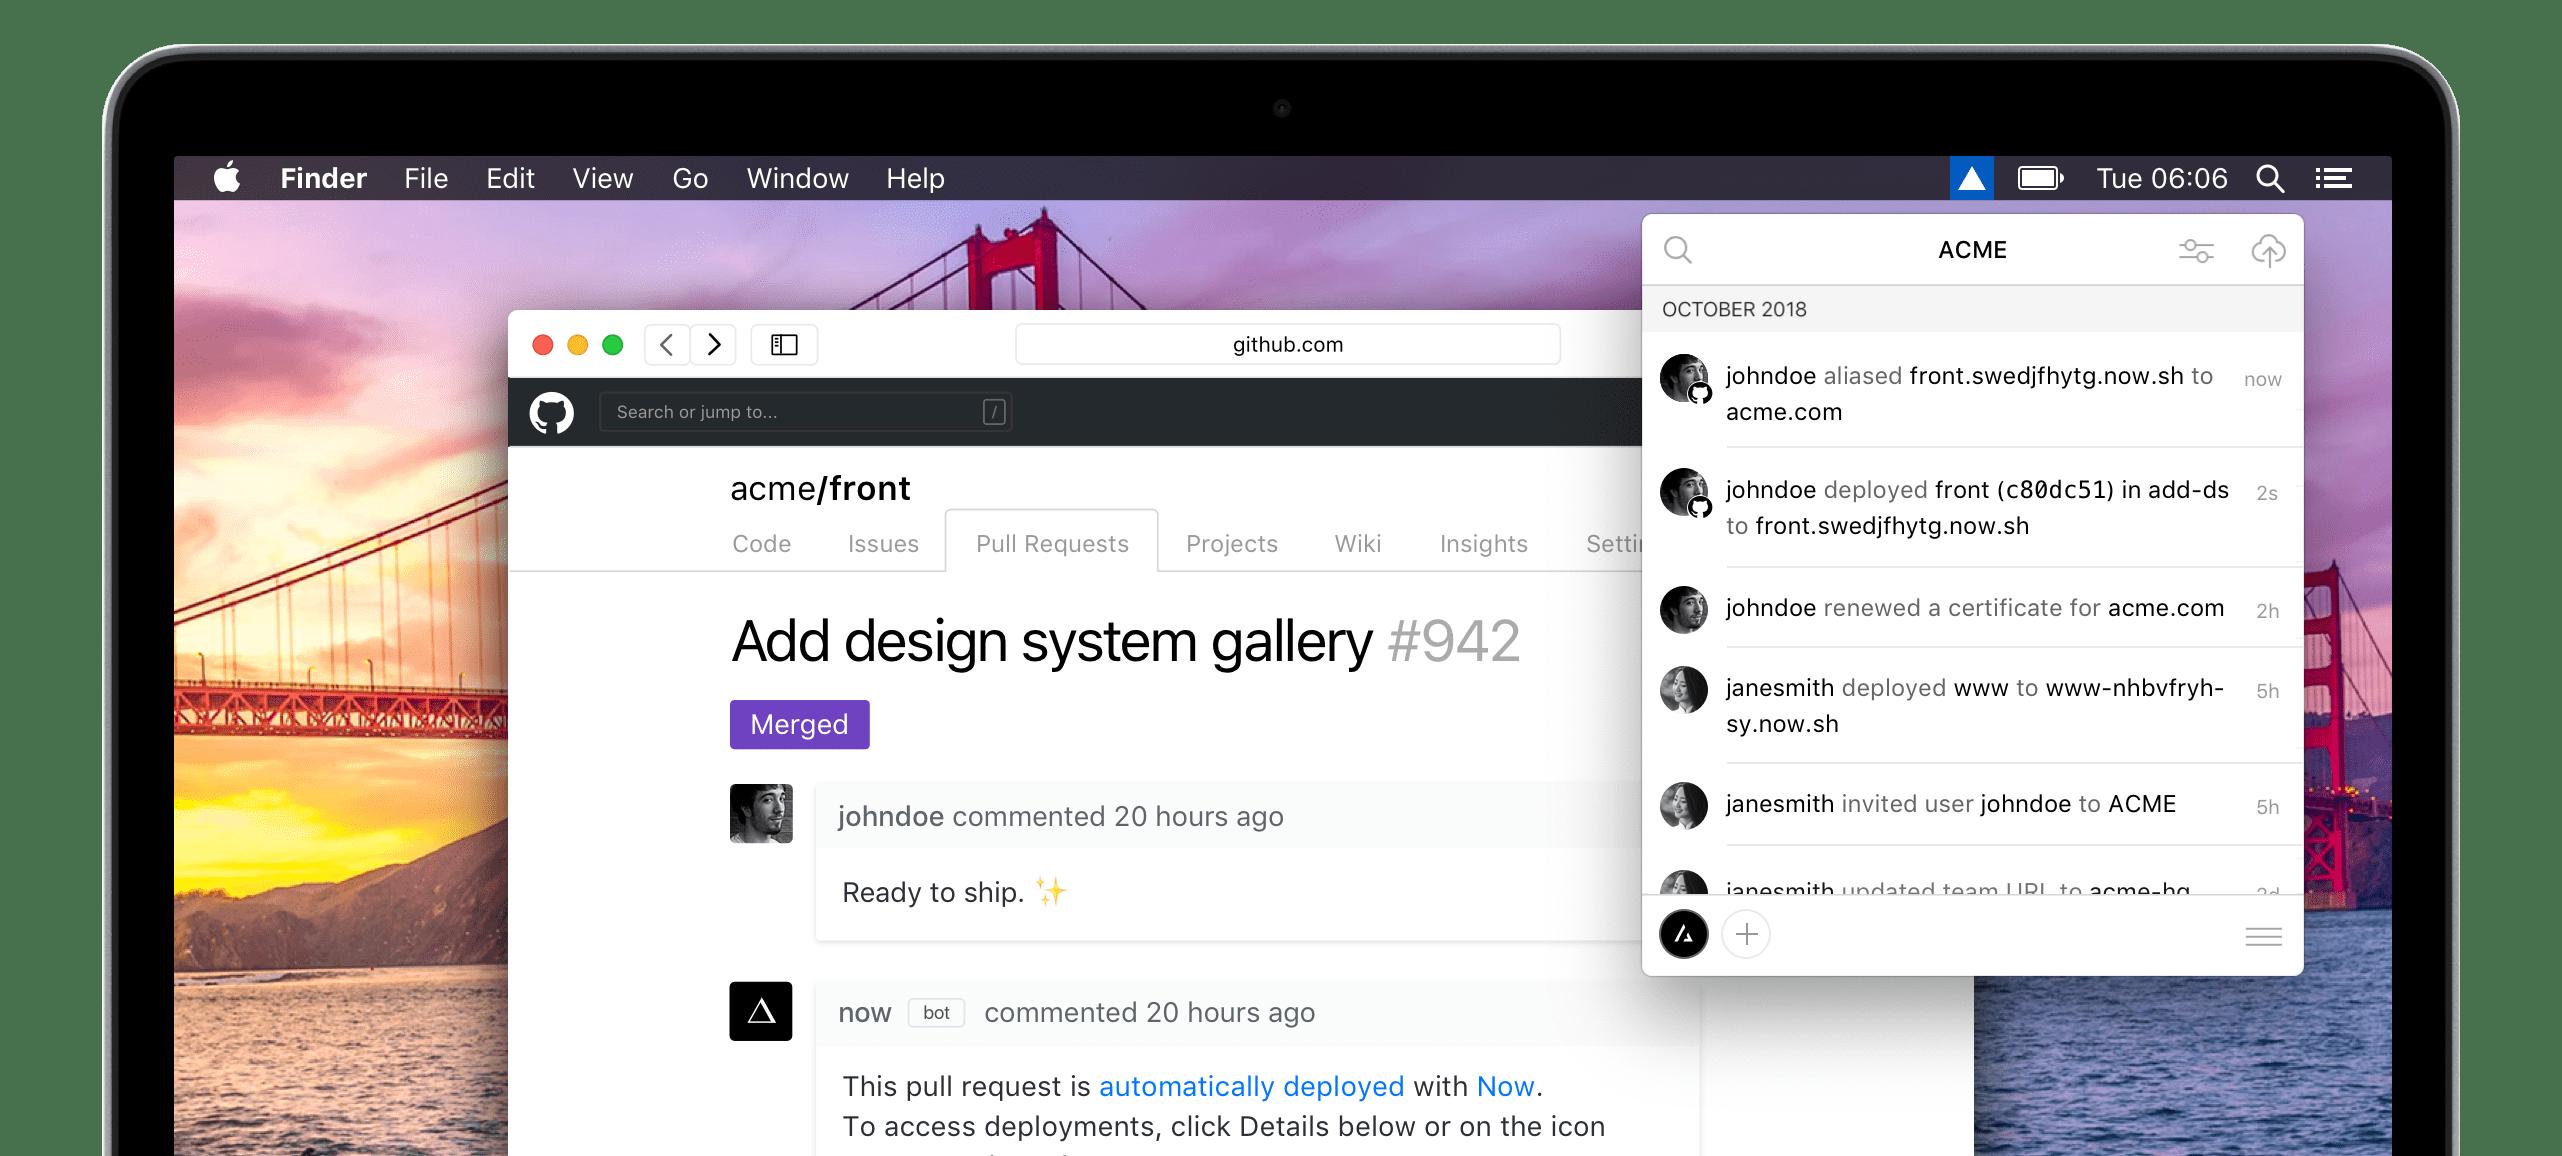 Full Workflow